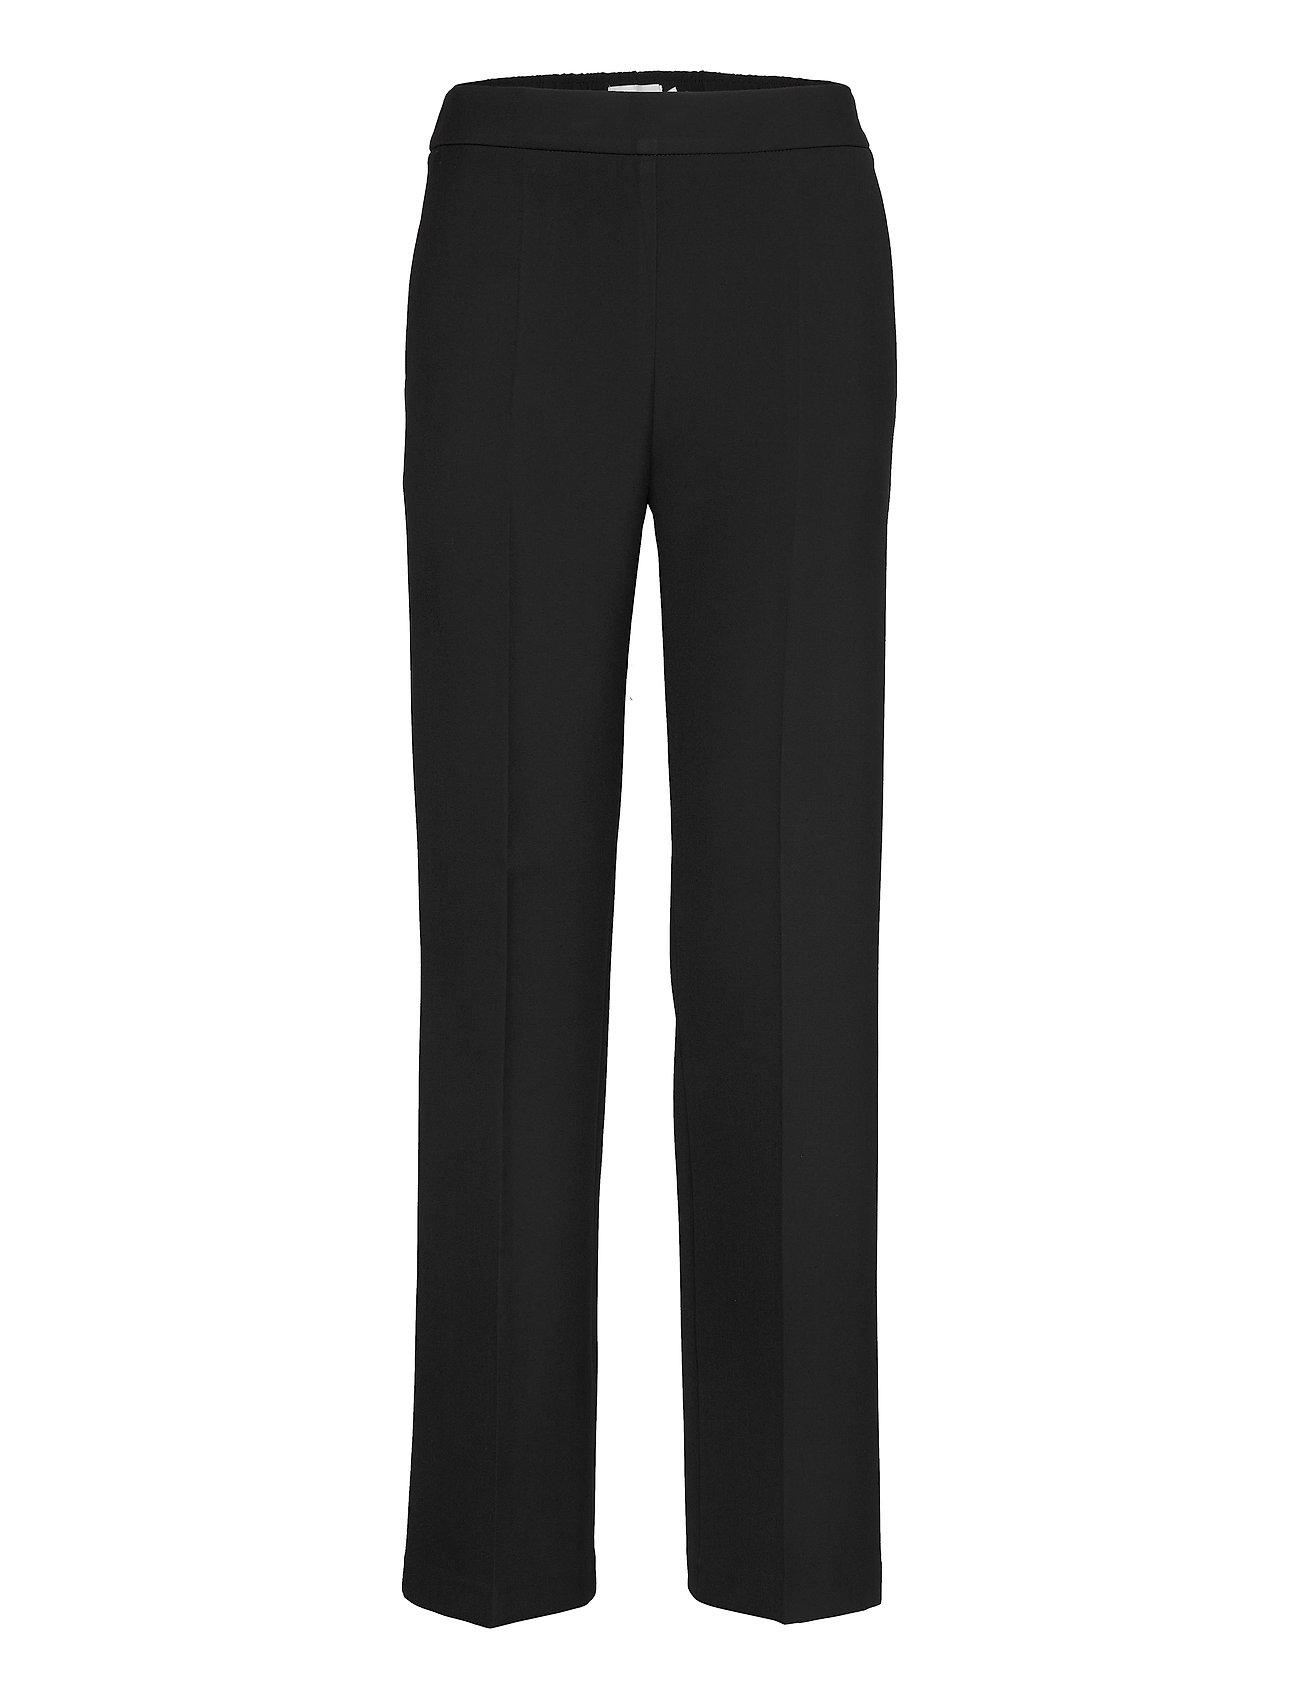 Image of Hakku Long Solid Trousers Bukser Med Lige Ben Sort Marimekko (3428857857)